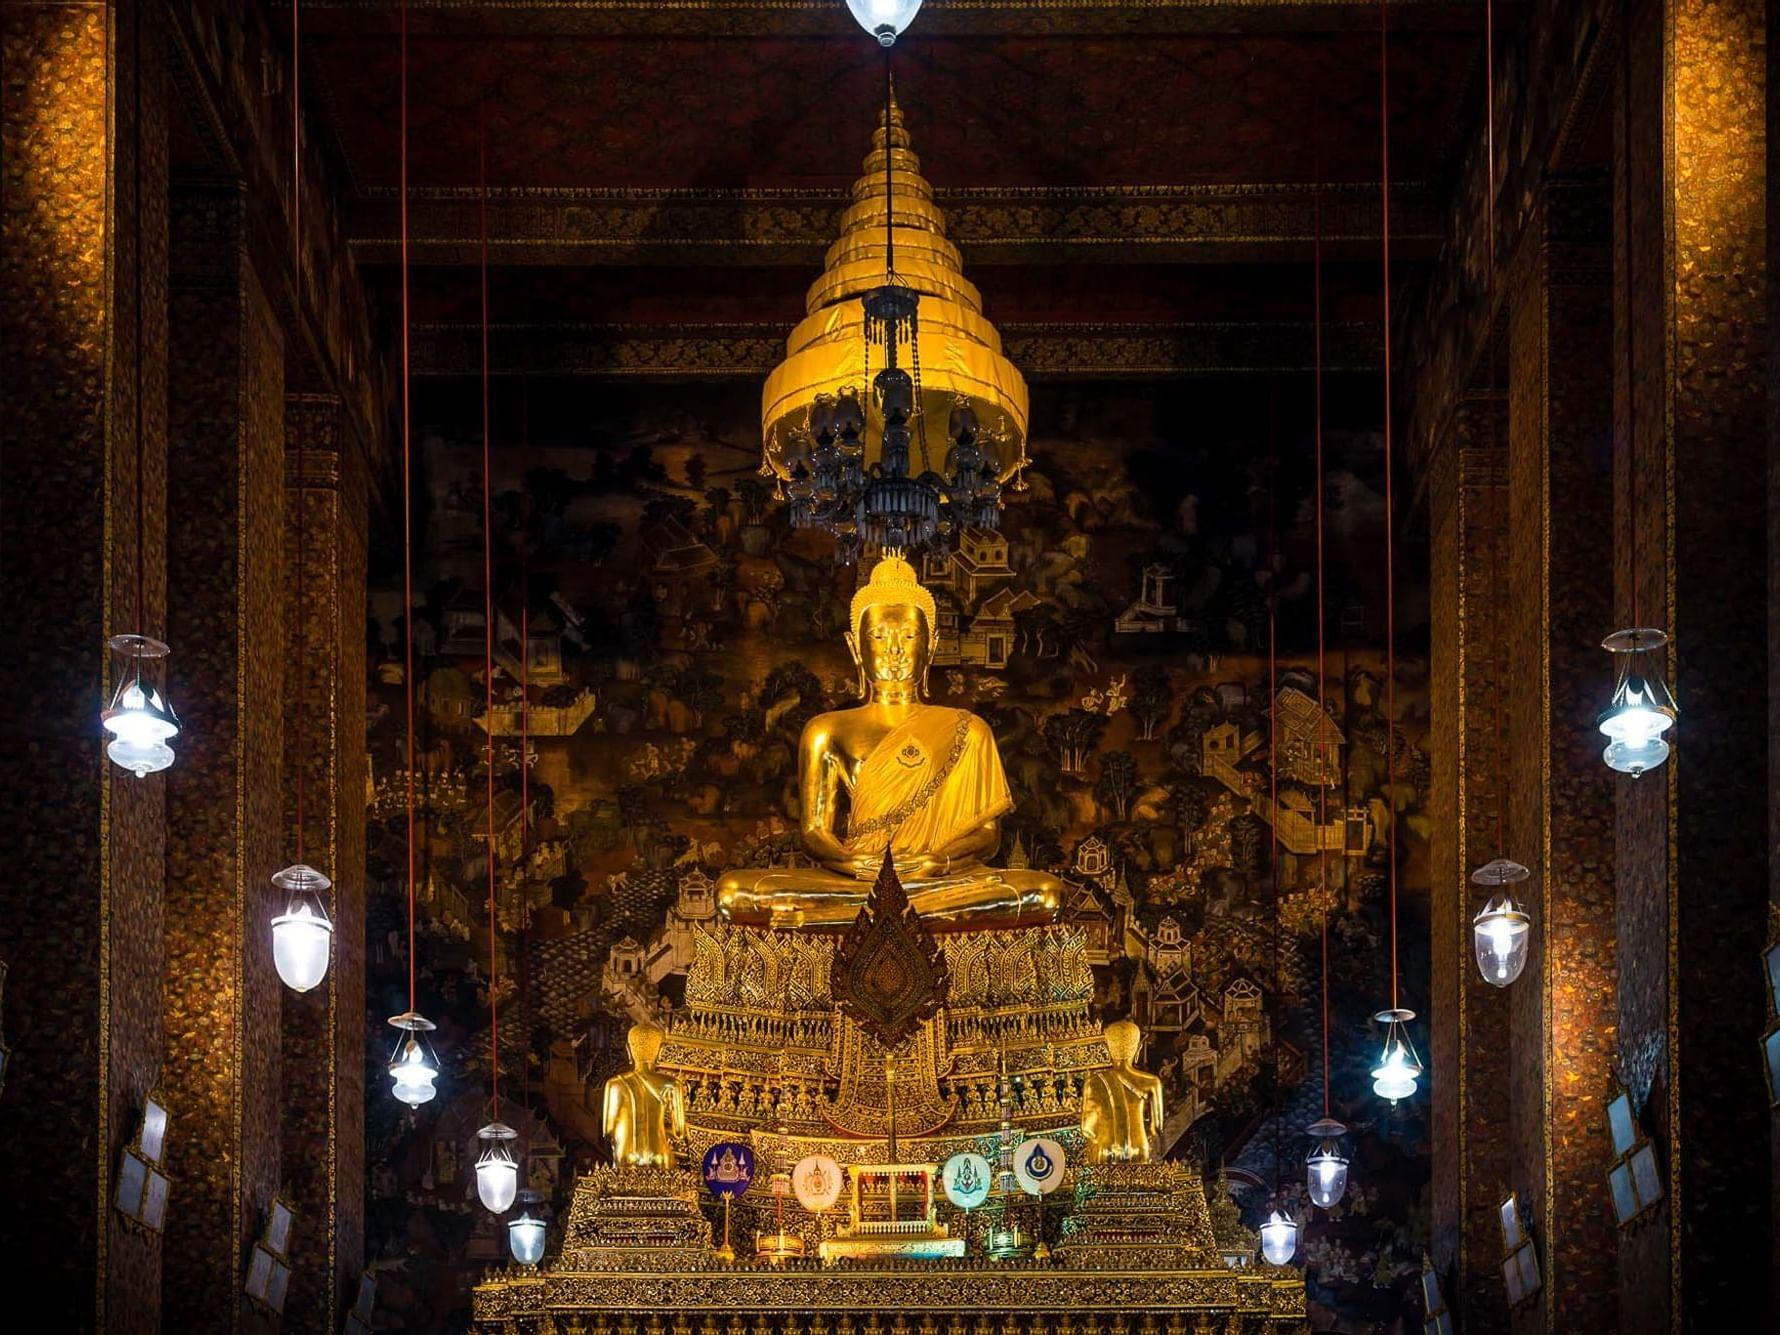 Wat Pho in Temple of the Reclining Buddha (Wat Pho) near Chatrium Hotel Riverside Bangkok